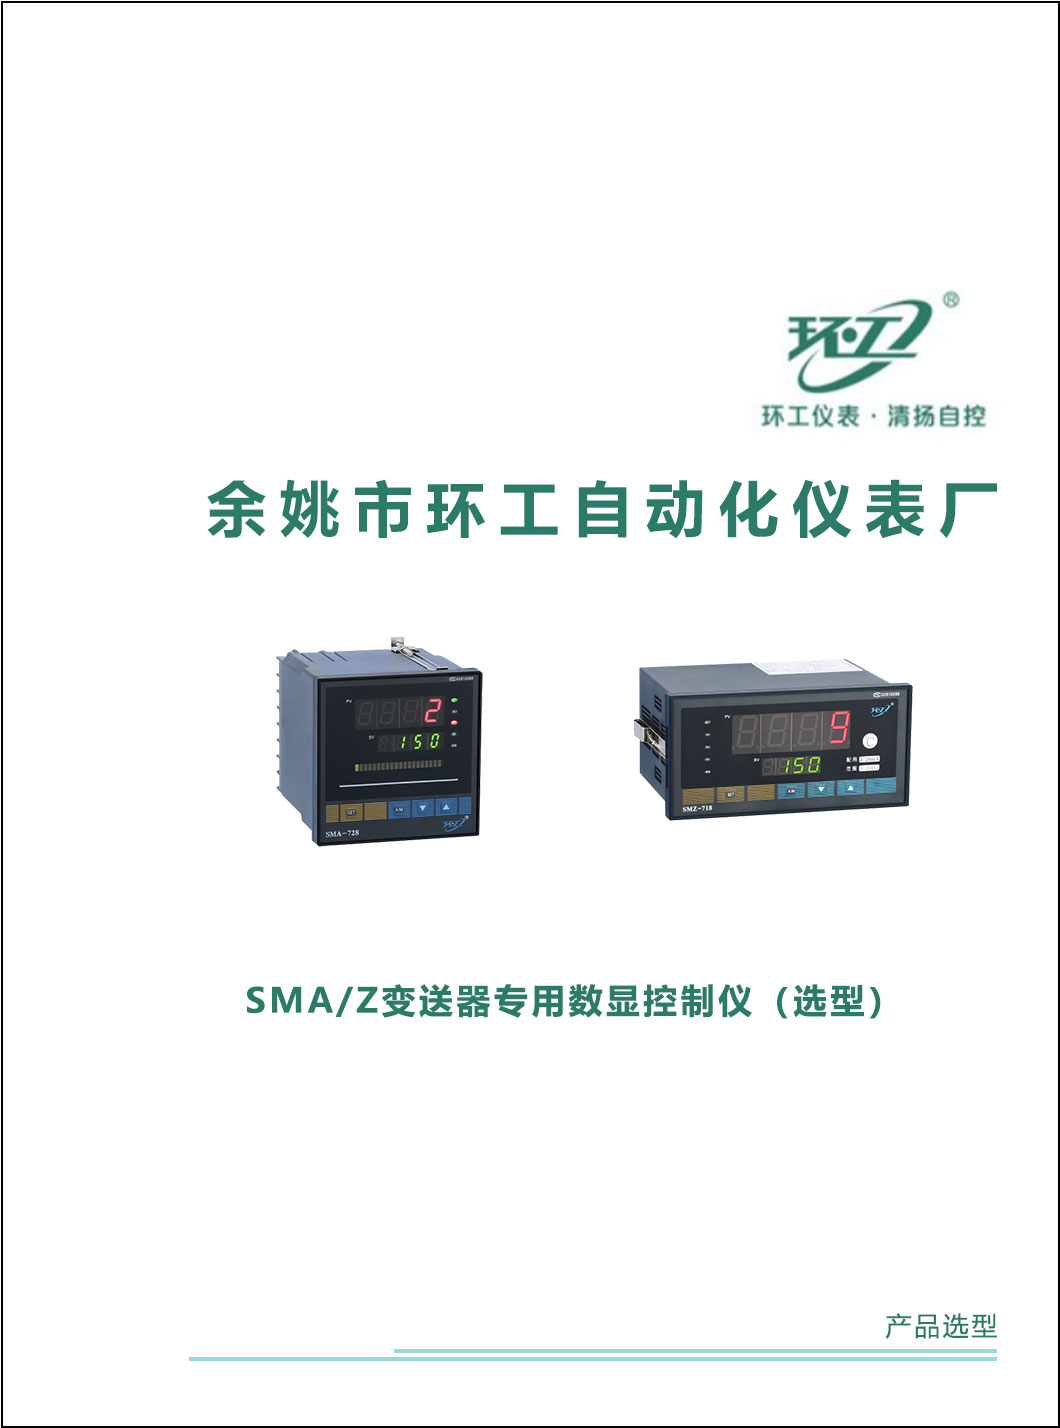 SMA/Z变送器专用数显控制仪-环工仪表-清扬自控